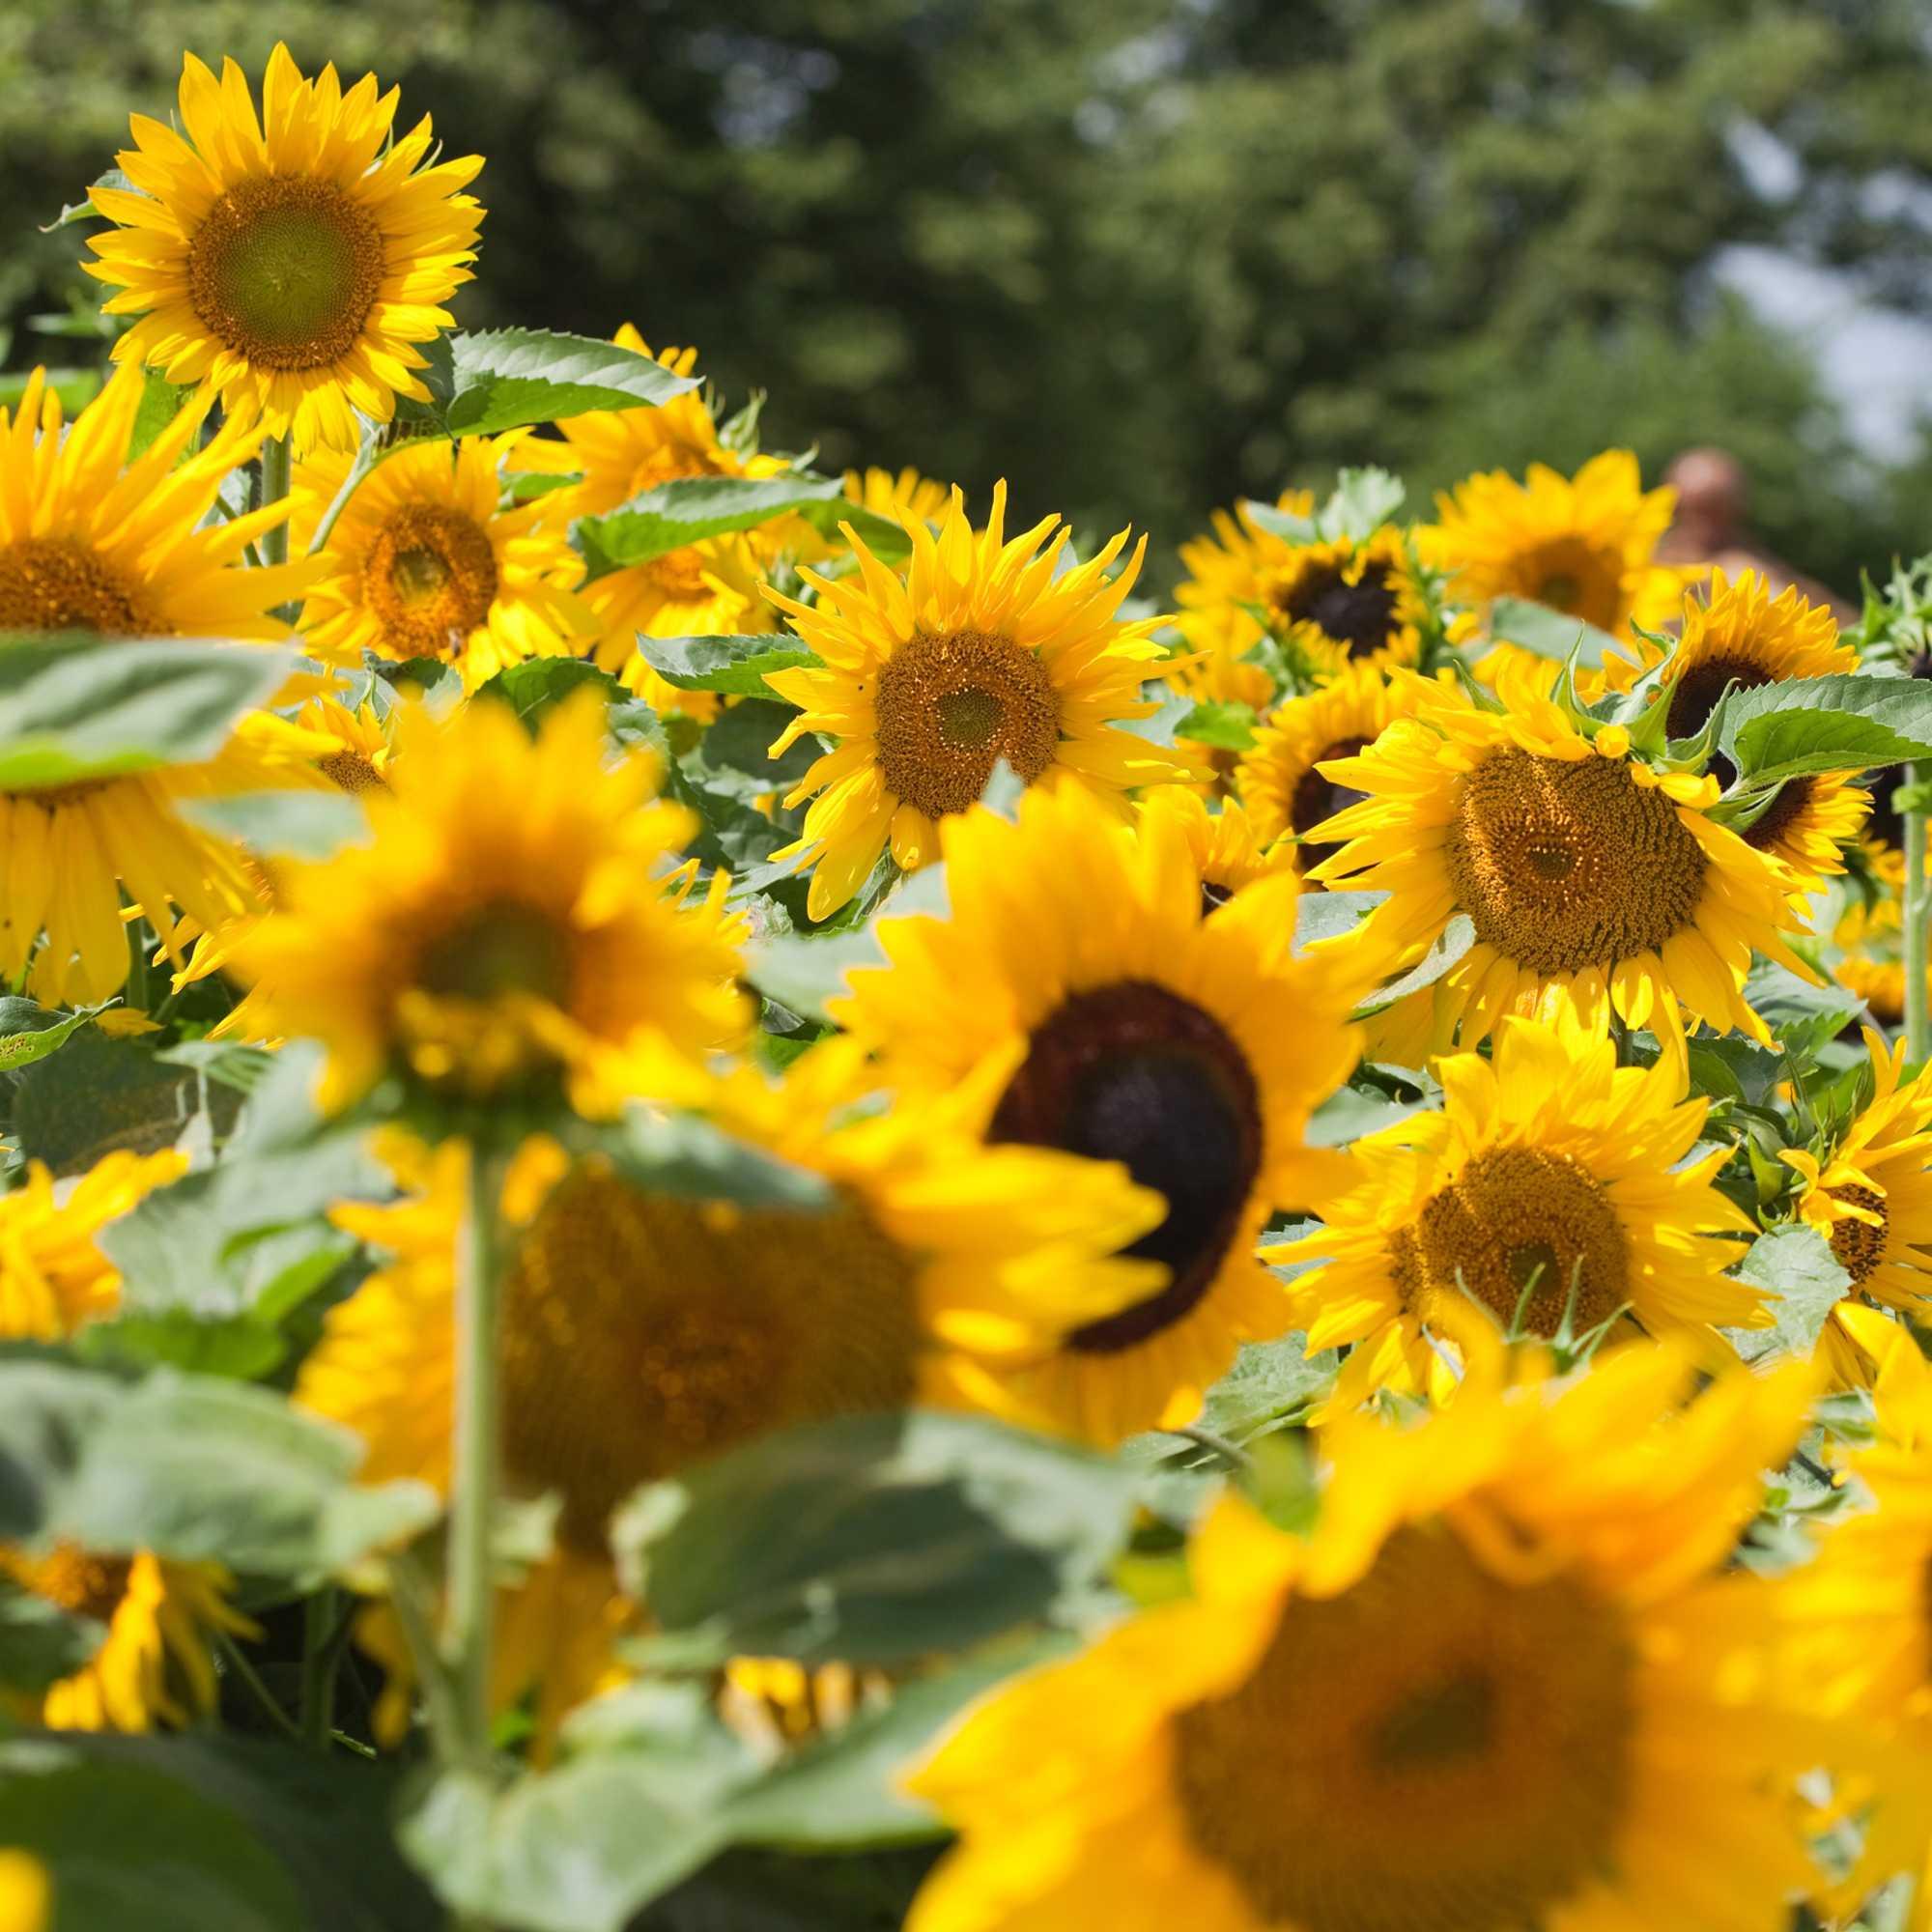 Auringonkukan Kasvatus